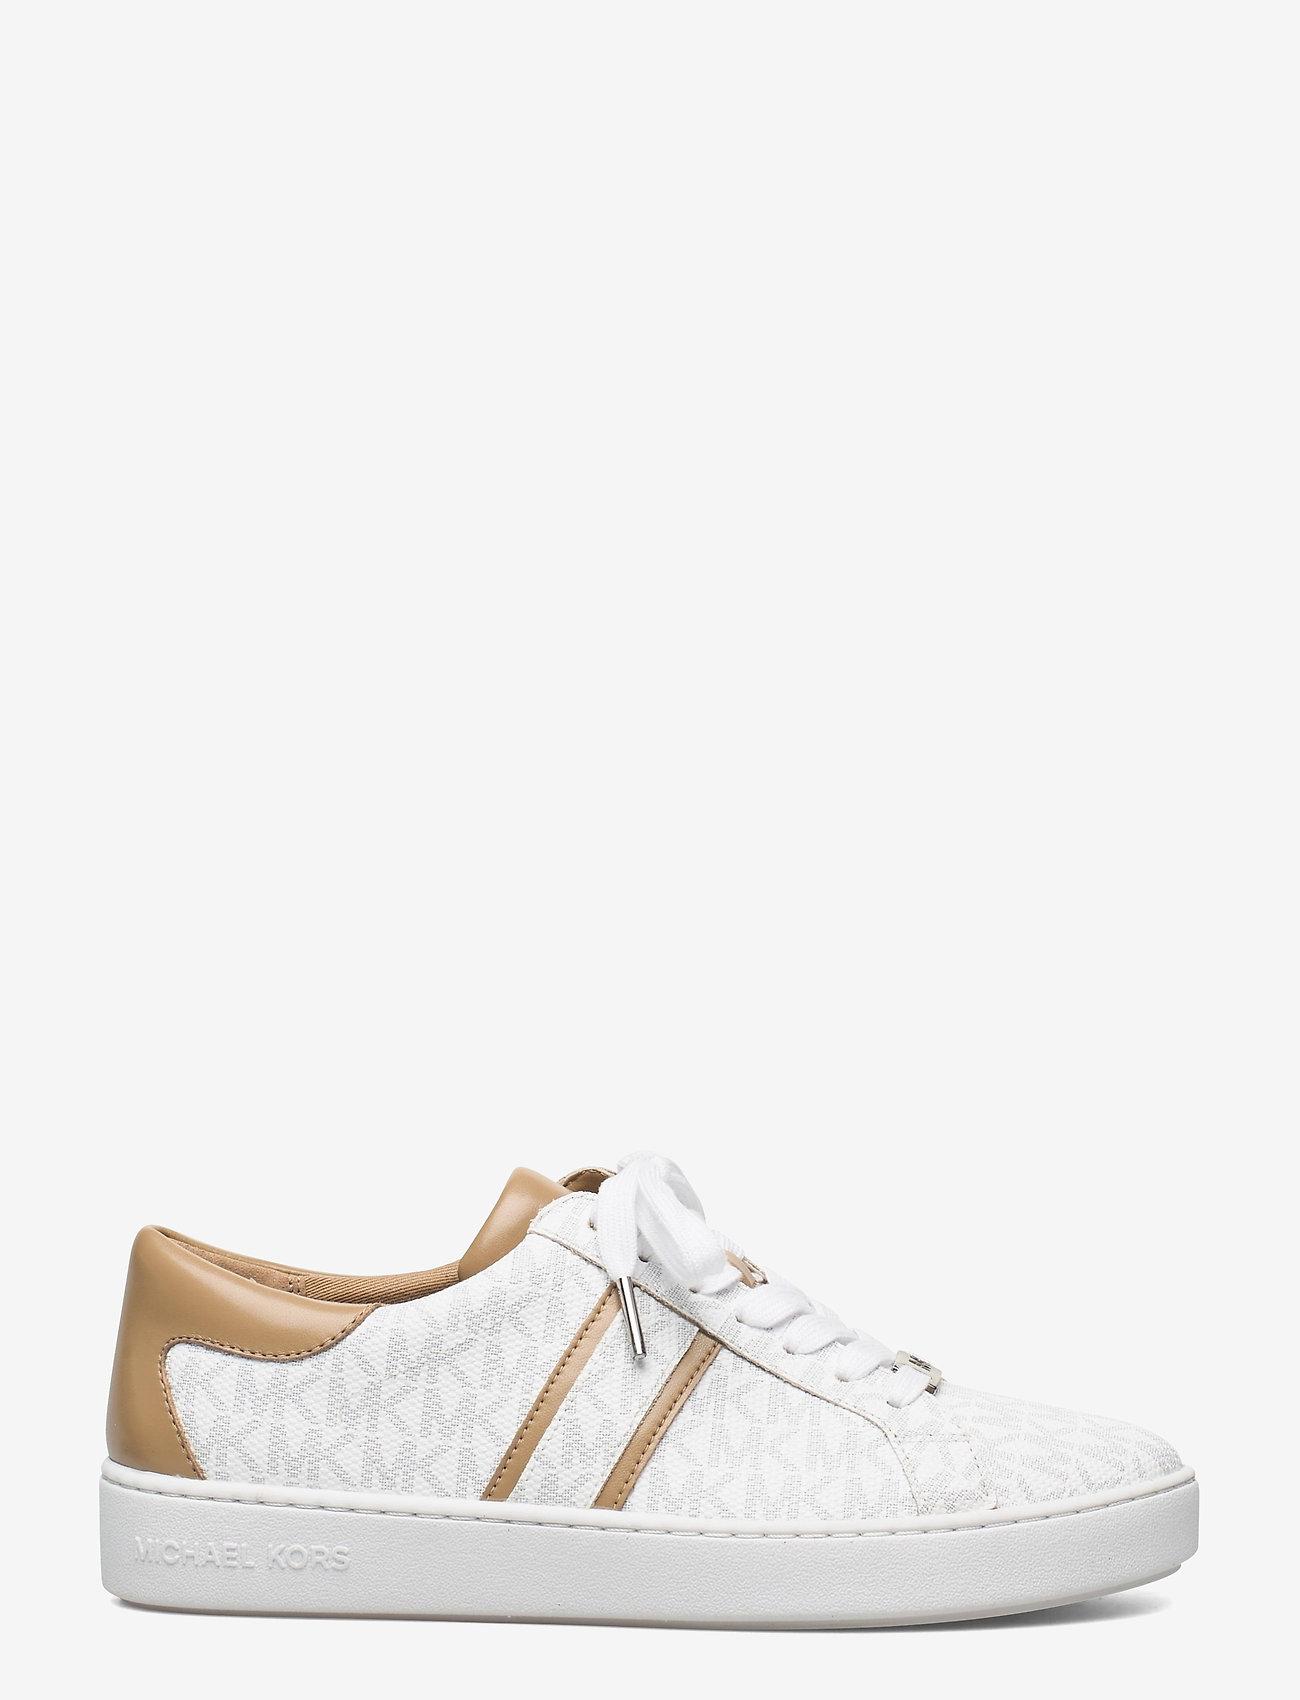 Michael Kors - KEATON STRIPE SNEAKER - lage sneakers - bright wht - 1